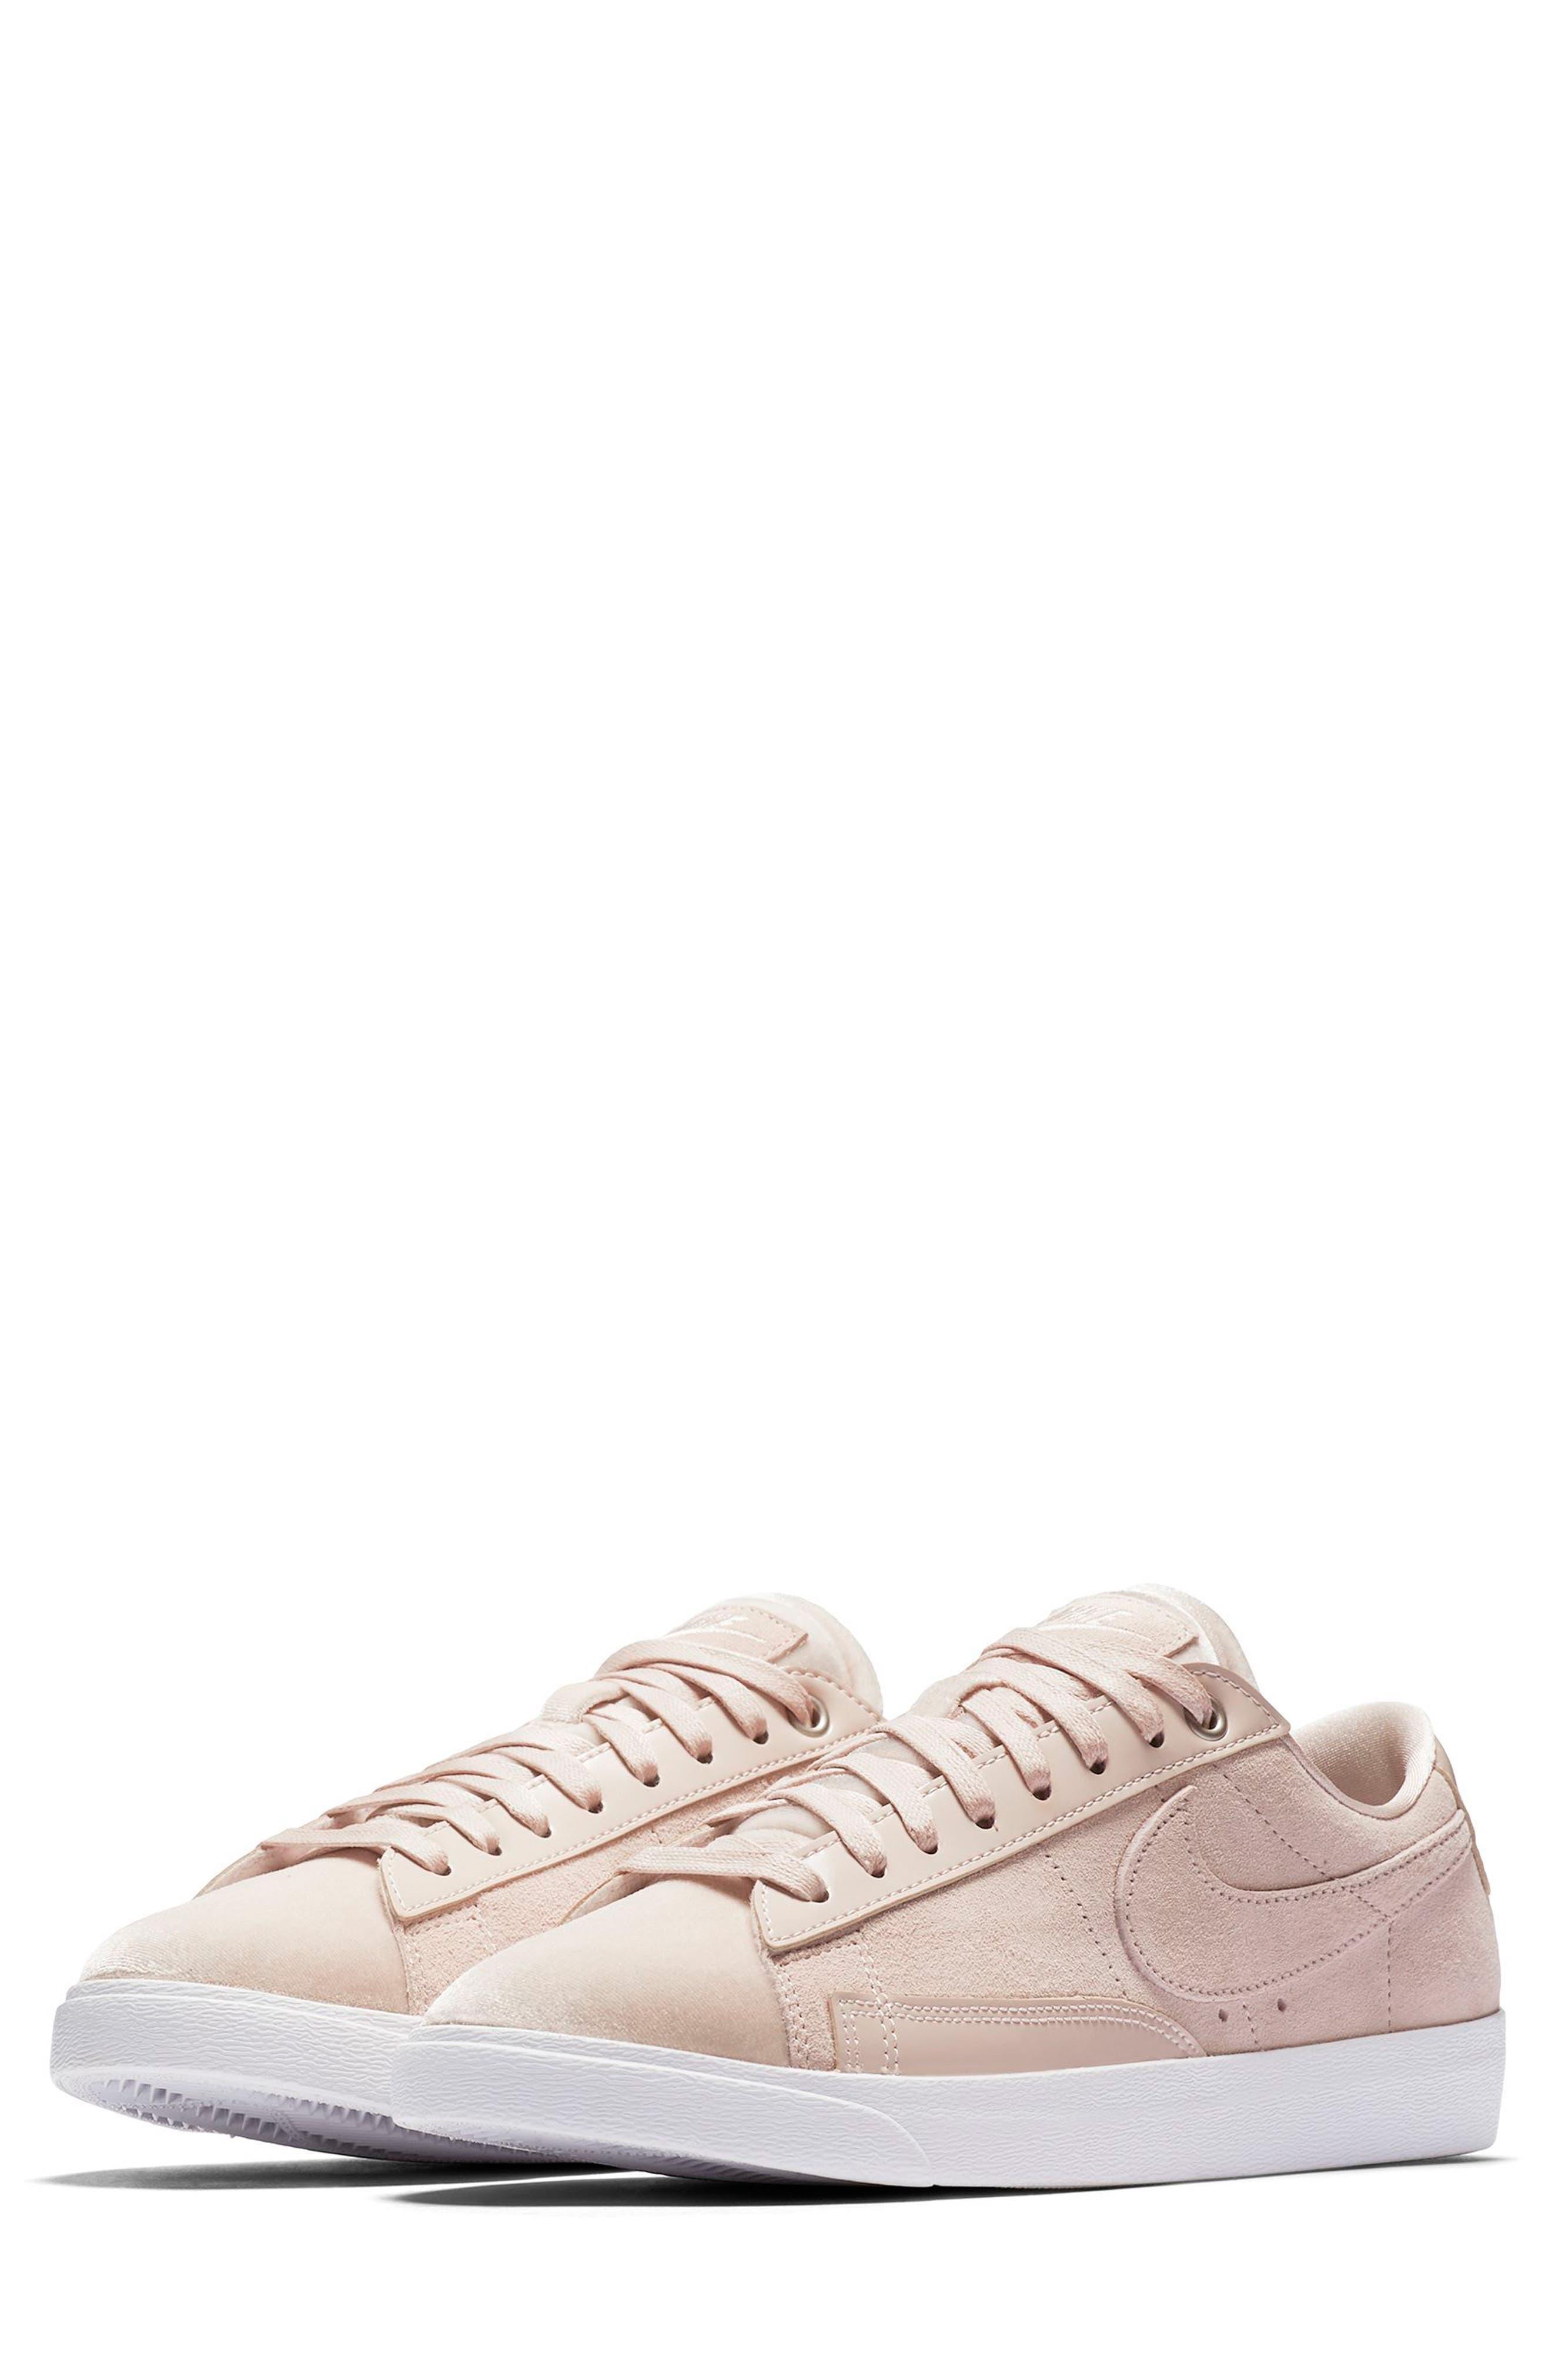 Blazer Low LX Sneaker,                             Main thumbnail 1, color,                             Silt Red/ Brown/ White